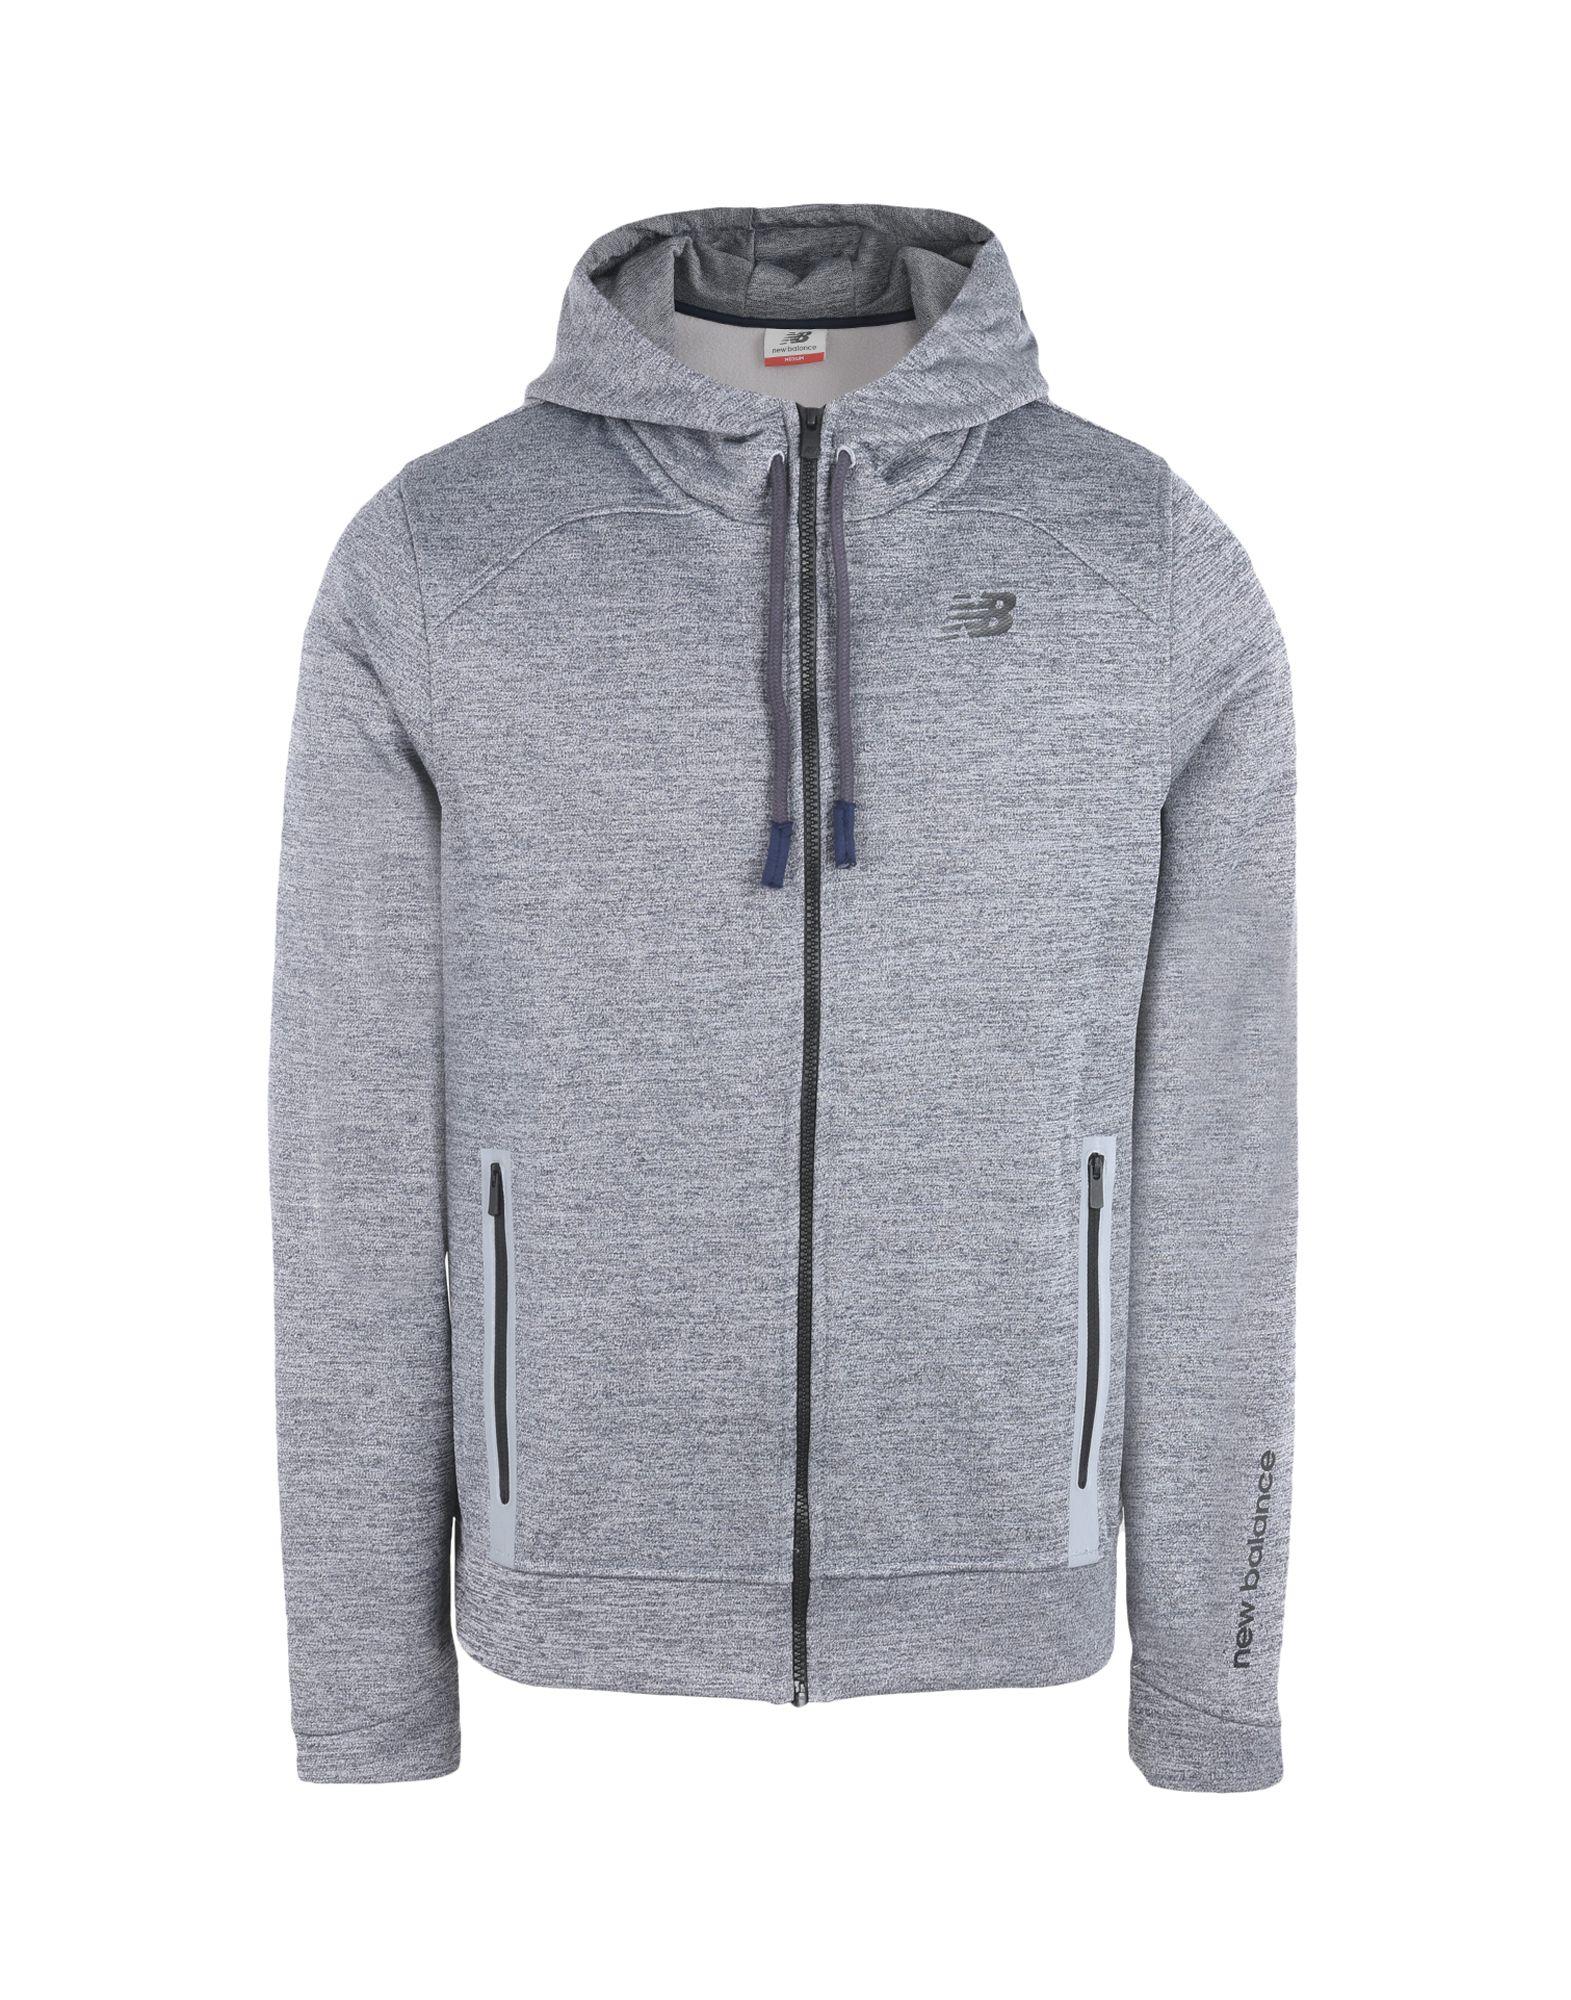 d40ae28bce786 Buy new balance hoodies & sweats for men - Best men's new balance hoodies &  sweats shop - Cools.com